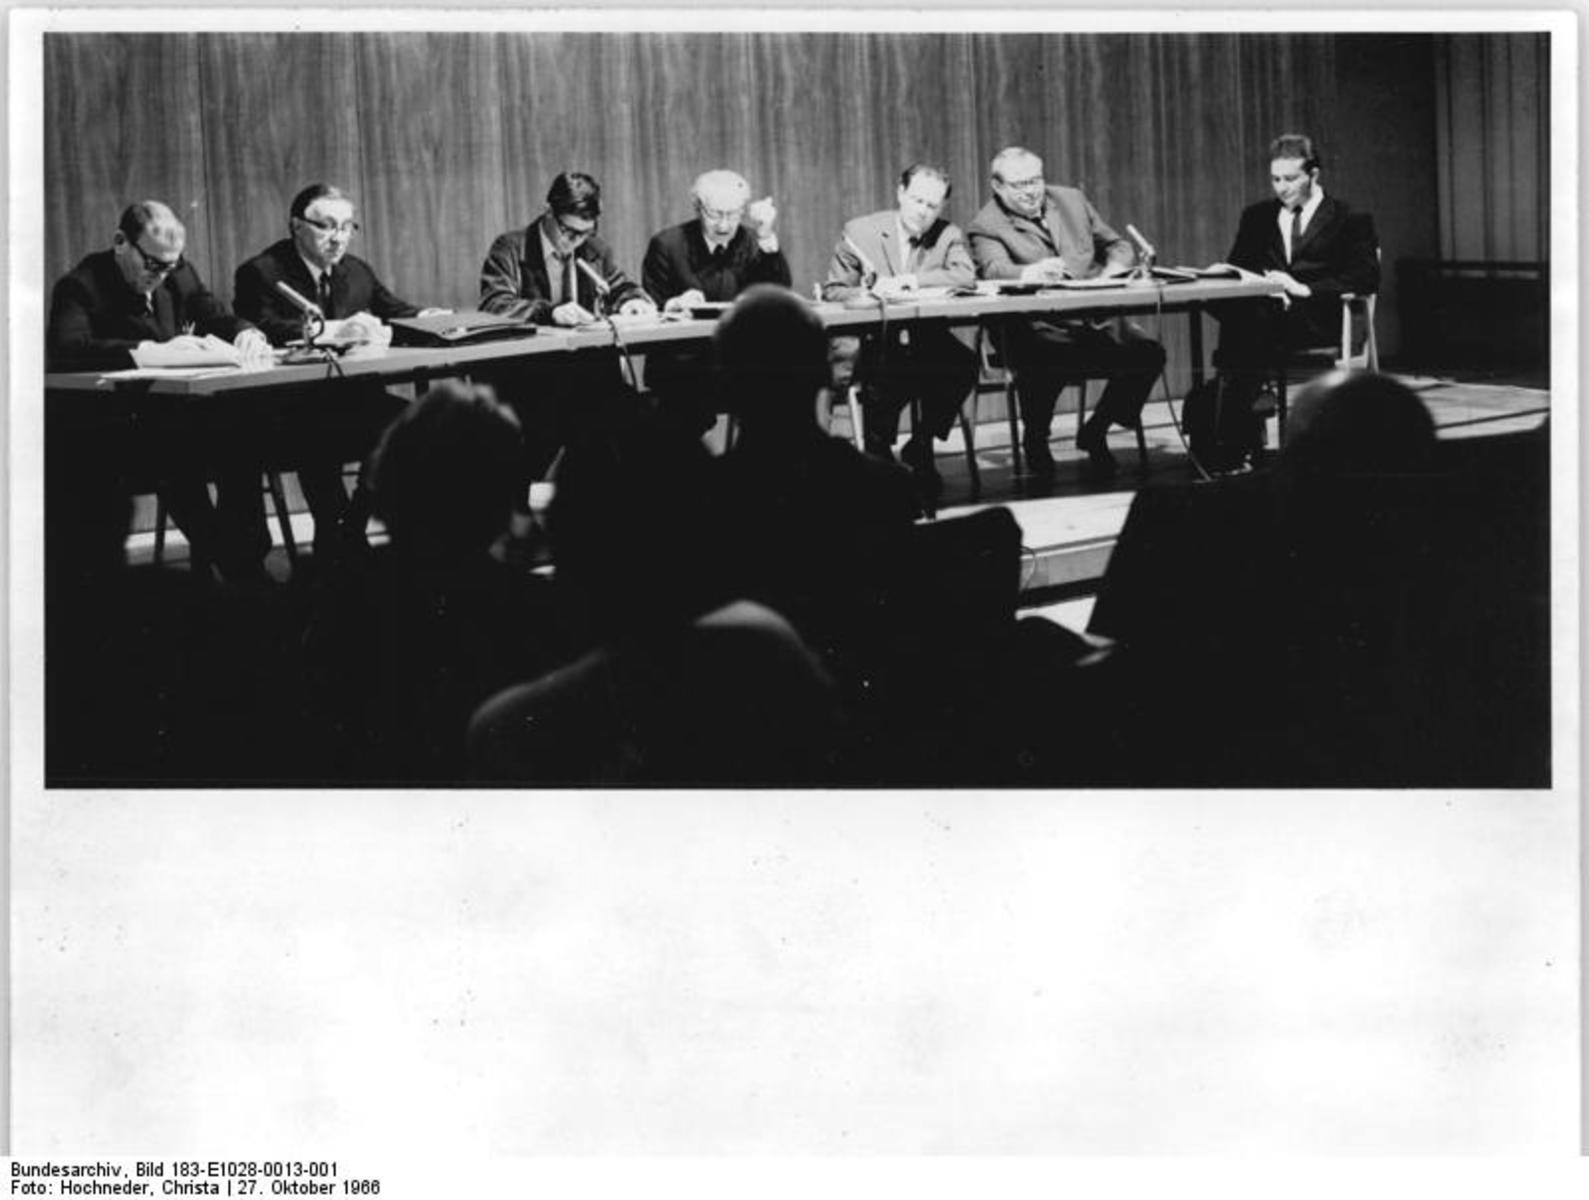 Bundesarchiv_Bild_183-E1028-0013-001,_Berlin,_Lesetheater_in_der_Stadtbibliothek.jpg